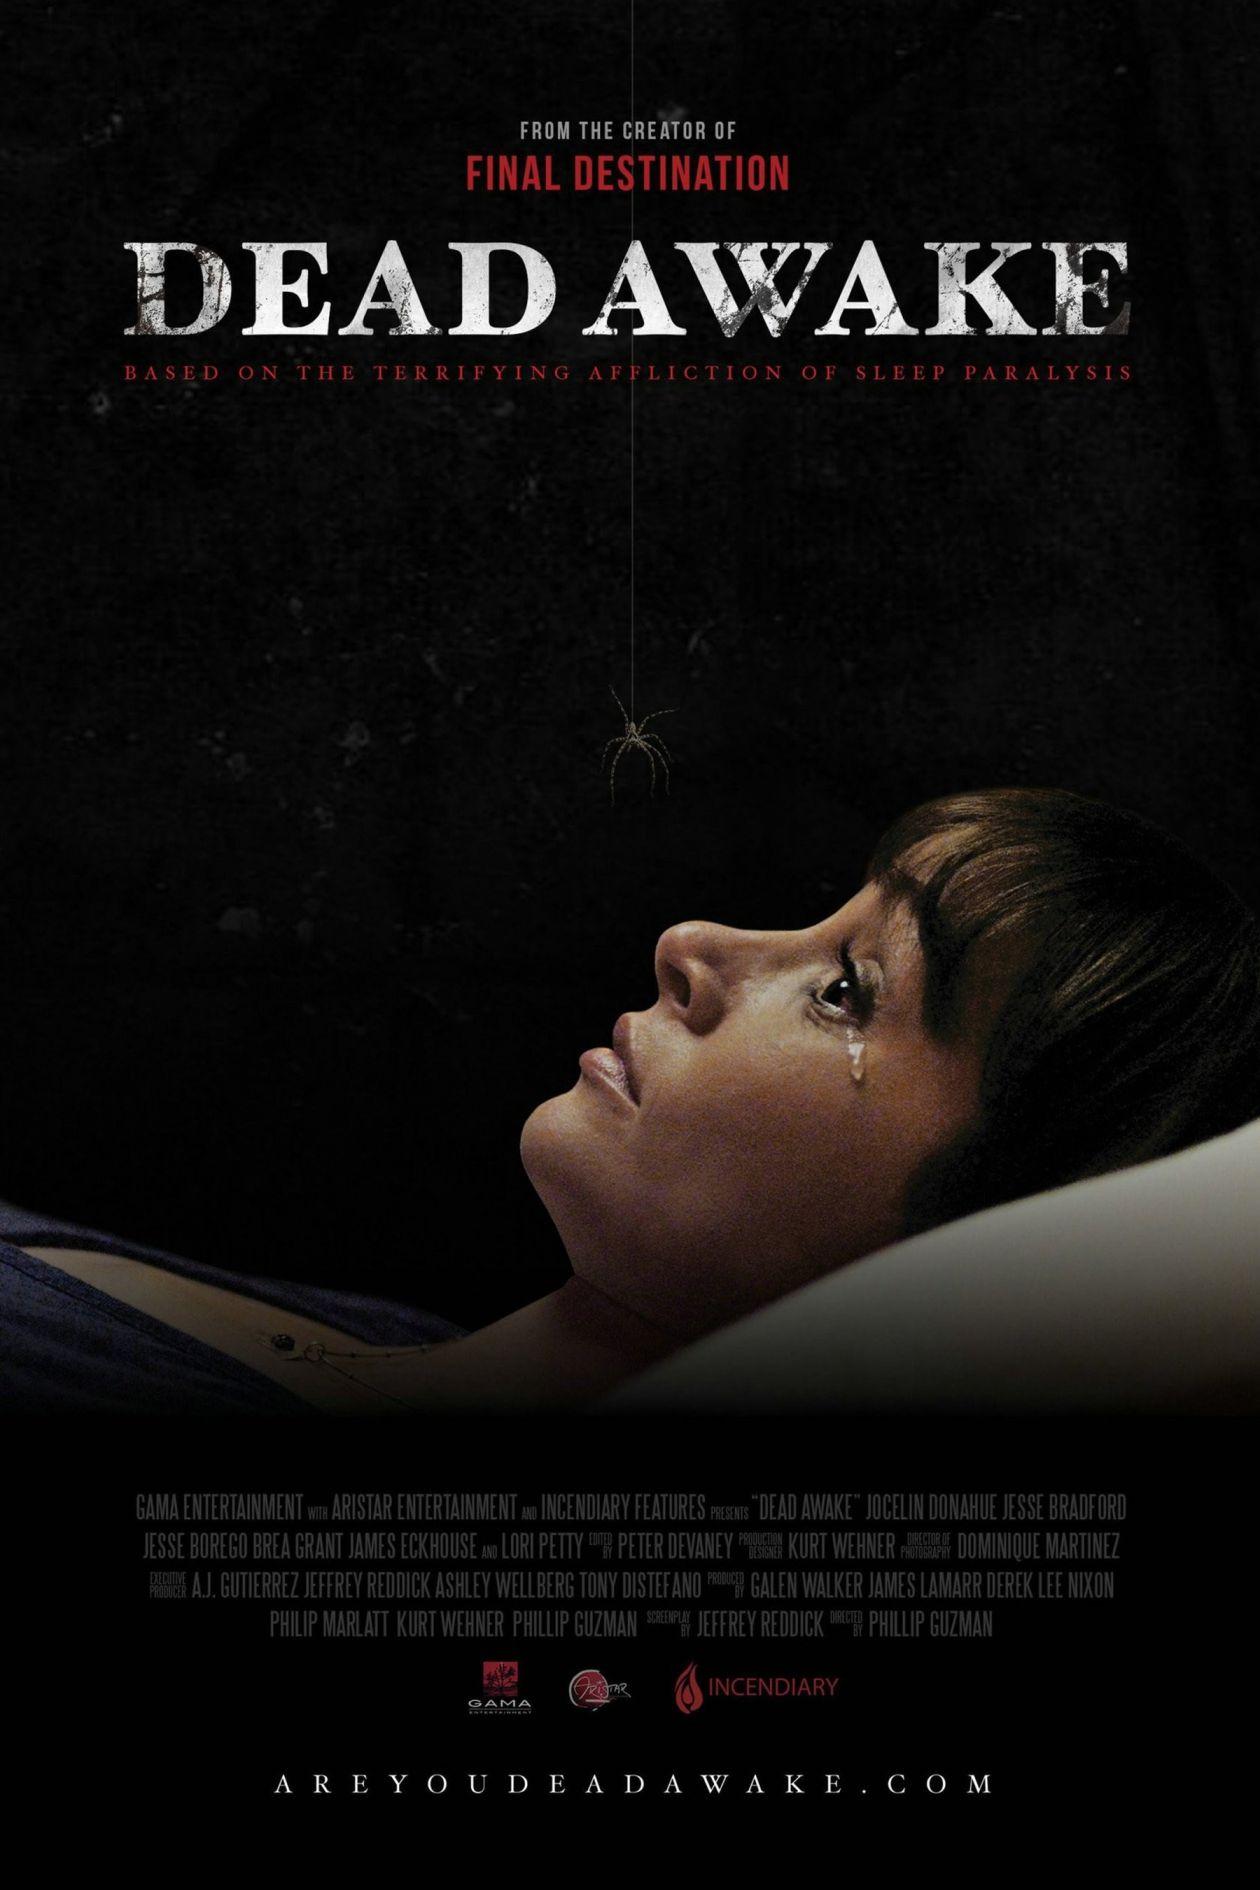 Jocelin Donahue actress / Kate Bowman & Beth her twin / Dead Awake 2016